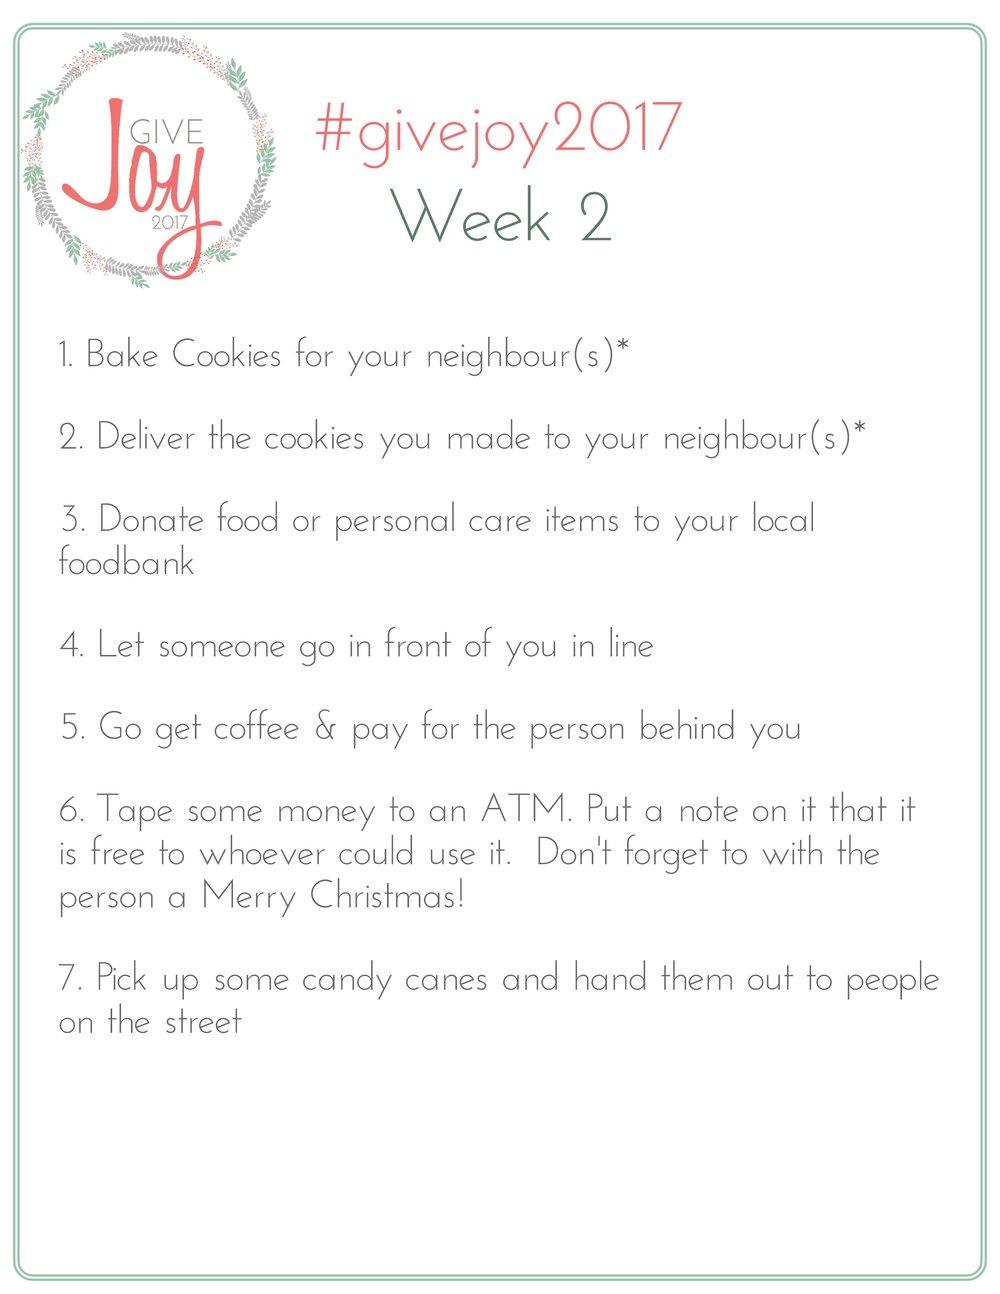 Give Joy 2017 Week 2 List of Challenges.jpeg